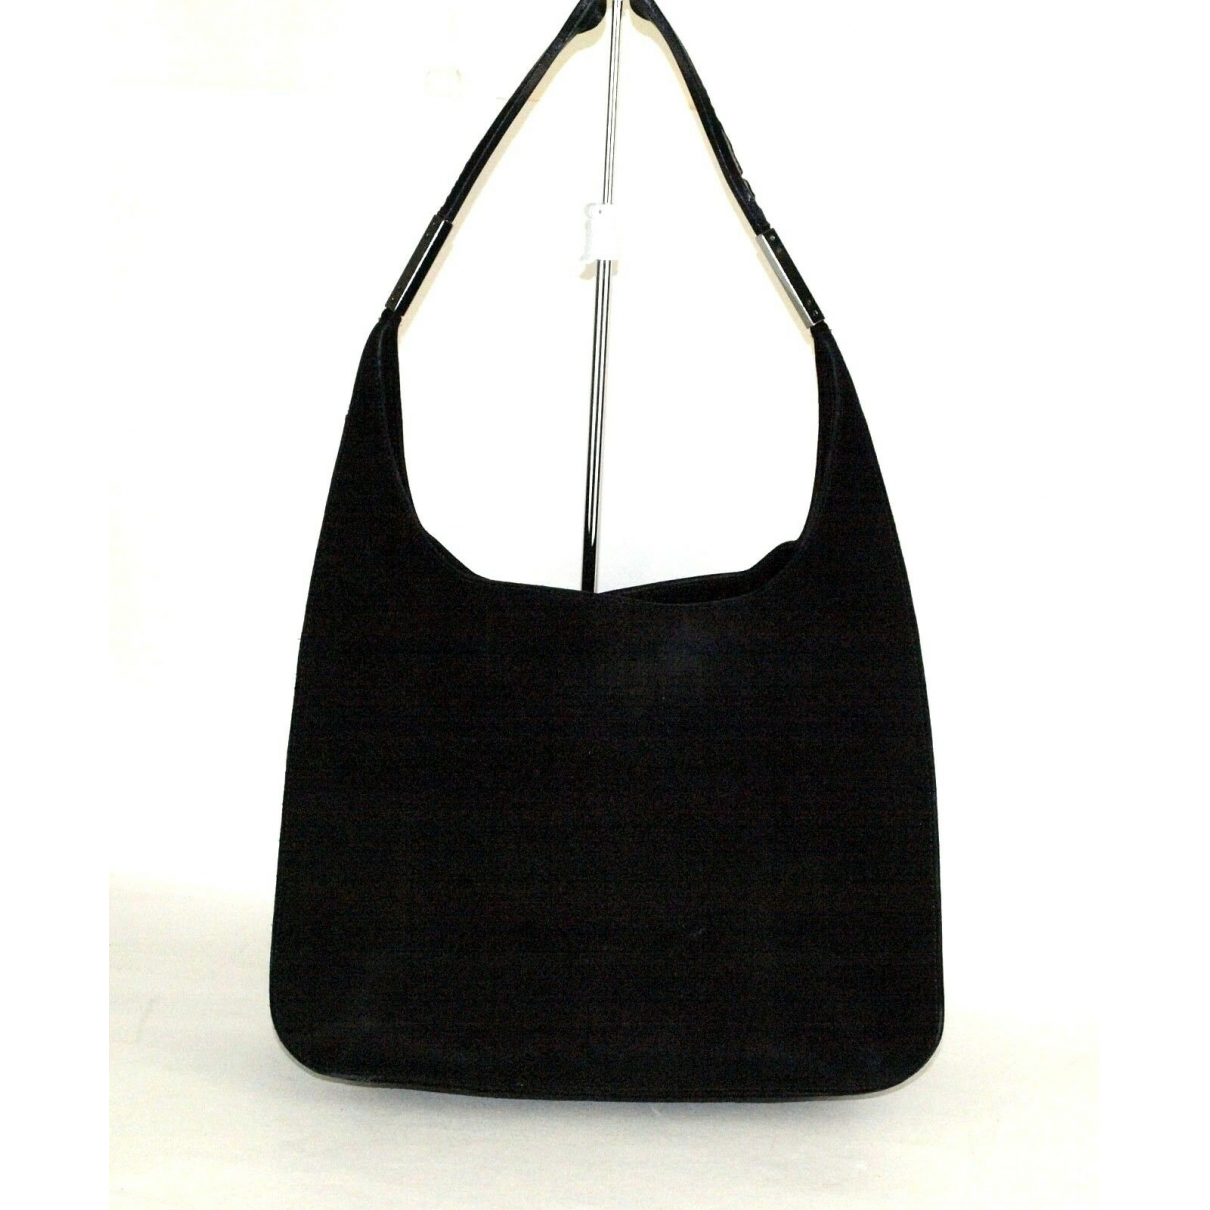 Gucci Hobo Handtasche in  Schwarz Leder